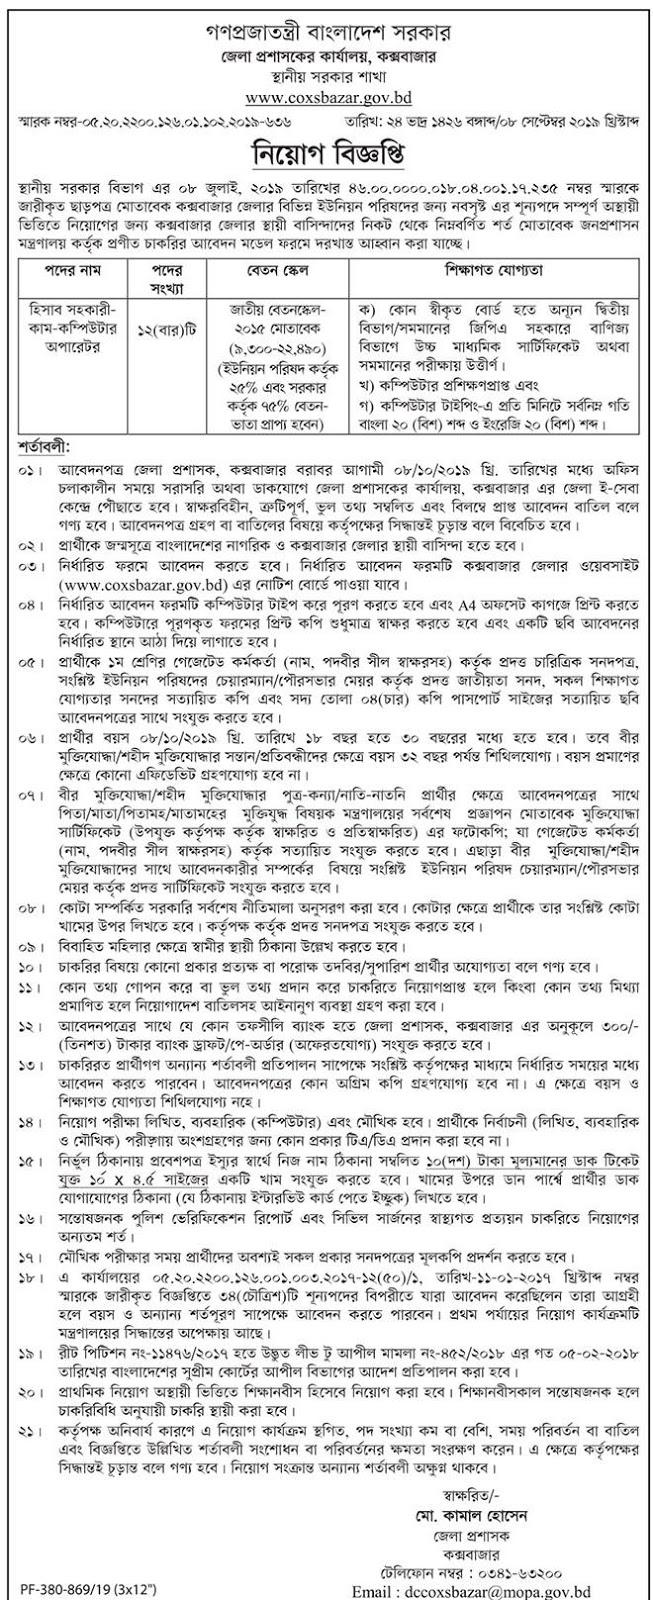 Asst. Accountant Cum Computer Operator Job Coxbazar Deupty Comissionar Office